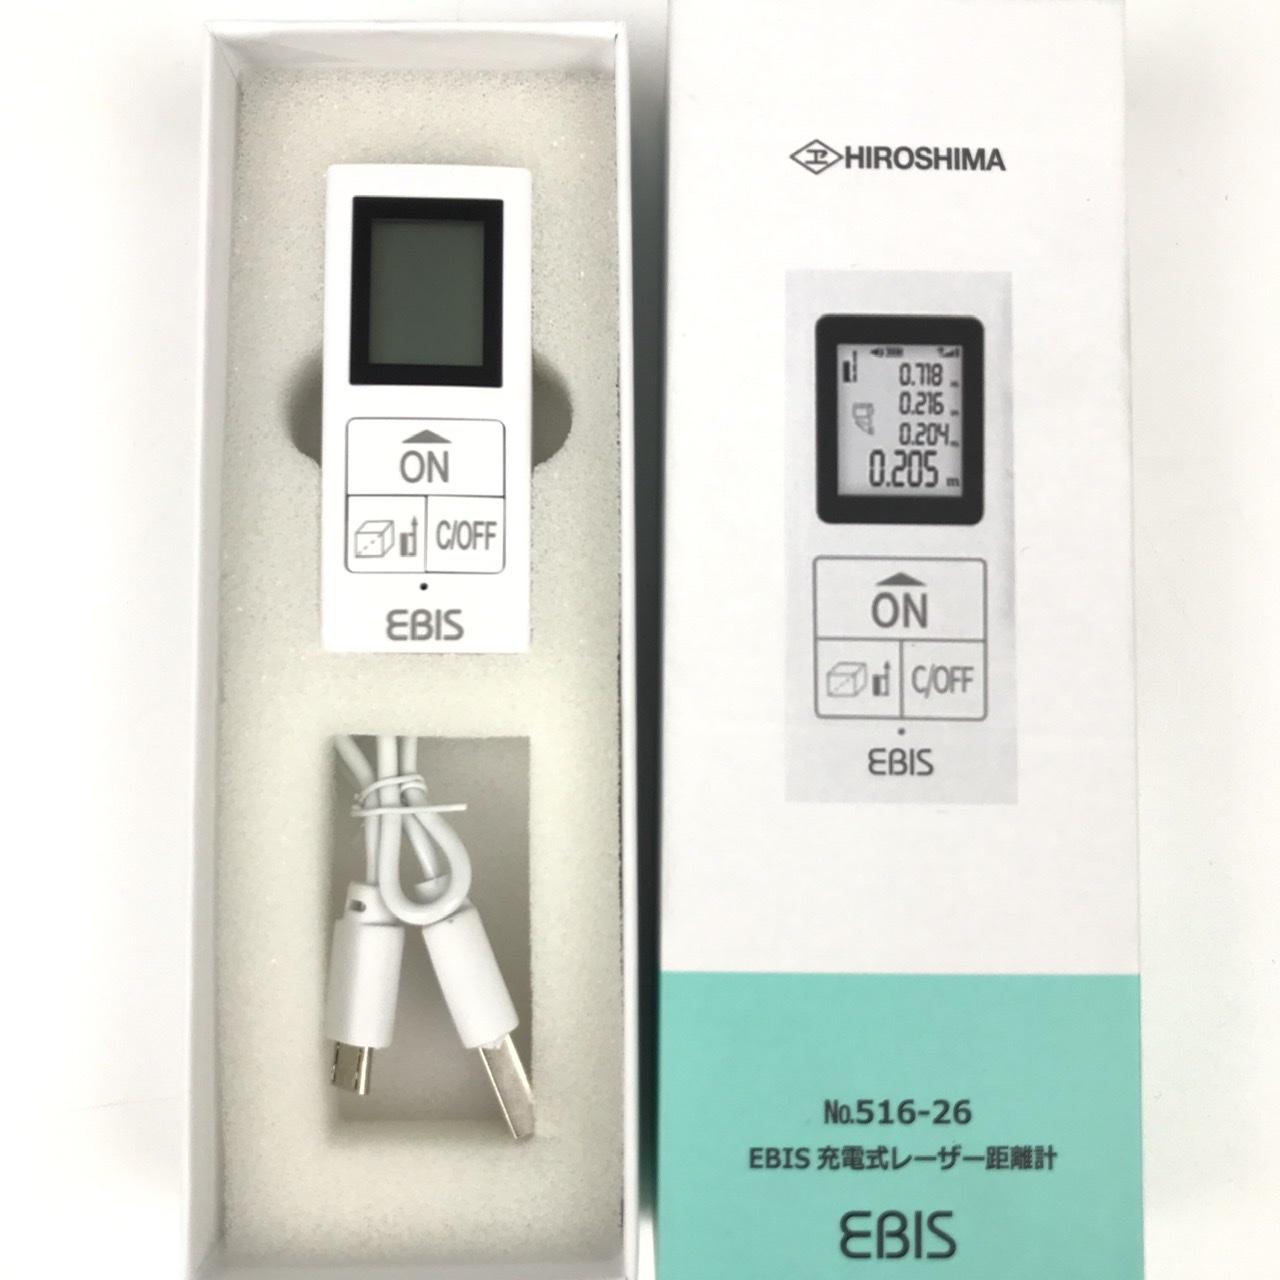 EBIS 充電式レーザー距離計